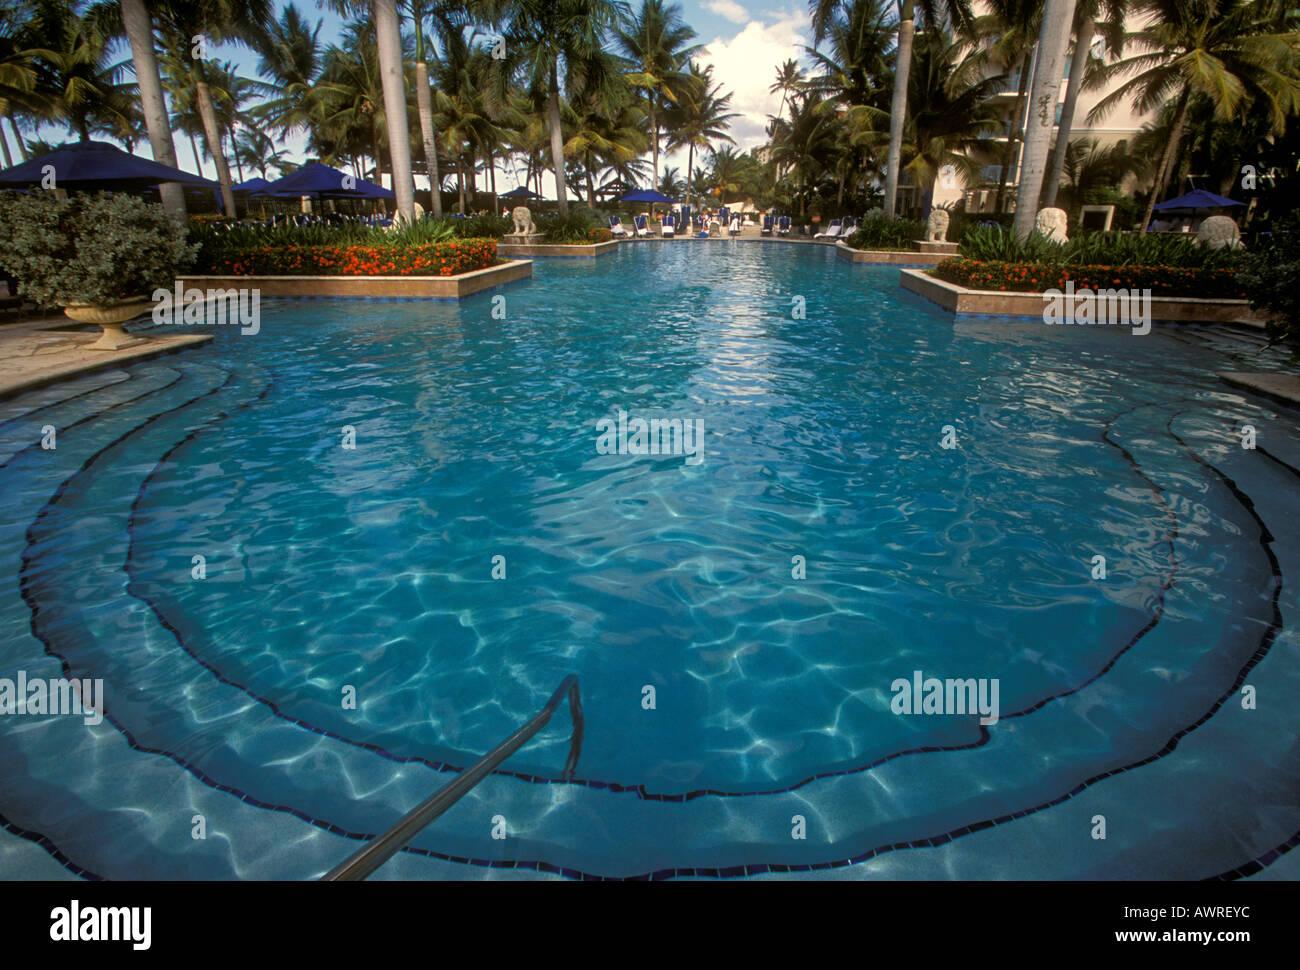 swimming pool ritz carlton san juan hotel spa and casino stock photo royalty free image